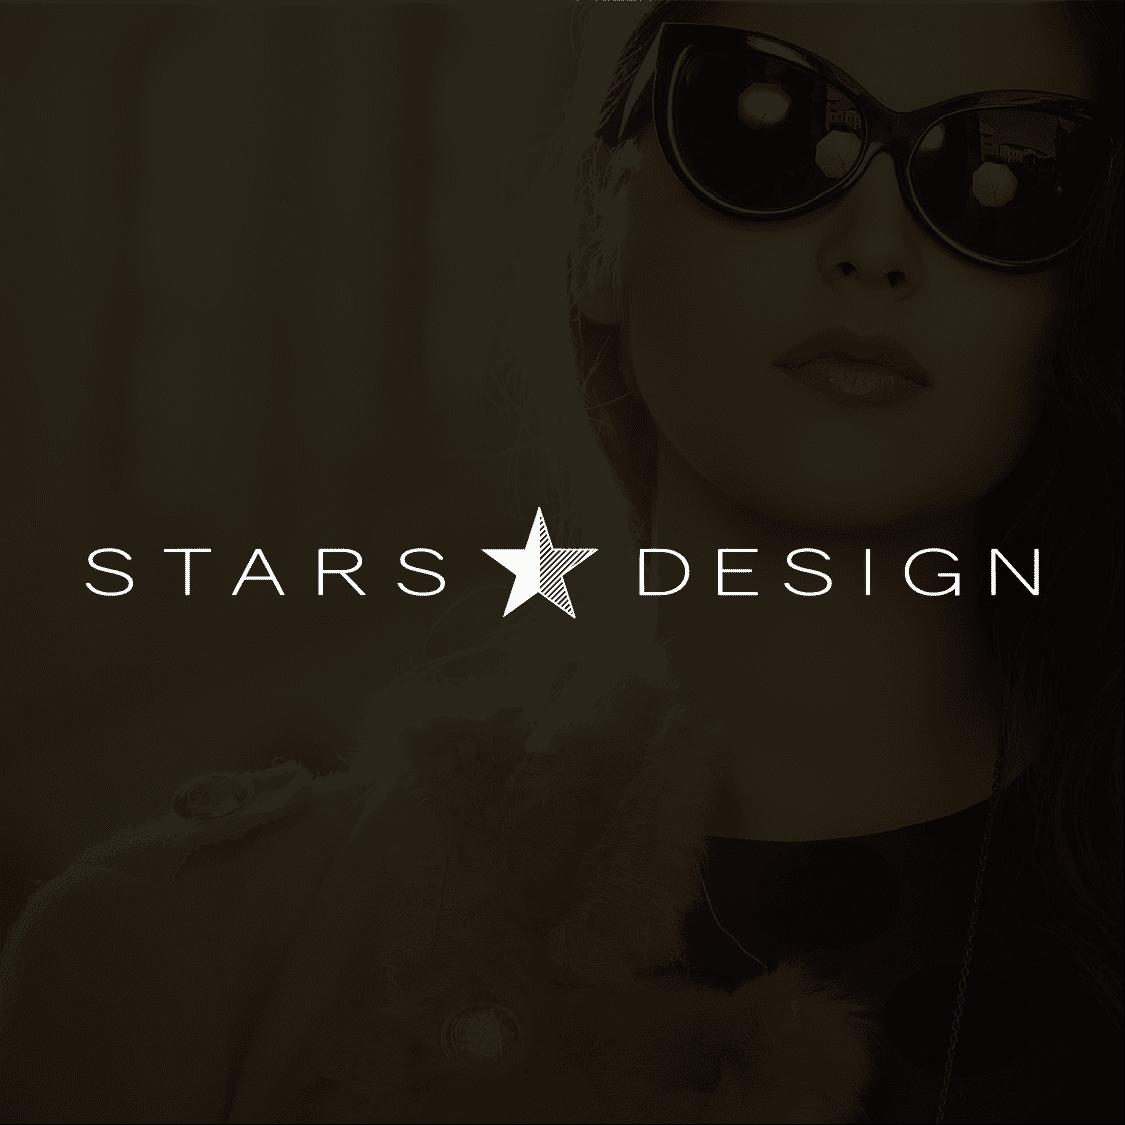 stars-design-group-by-white-box-create